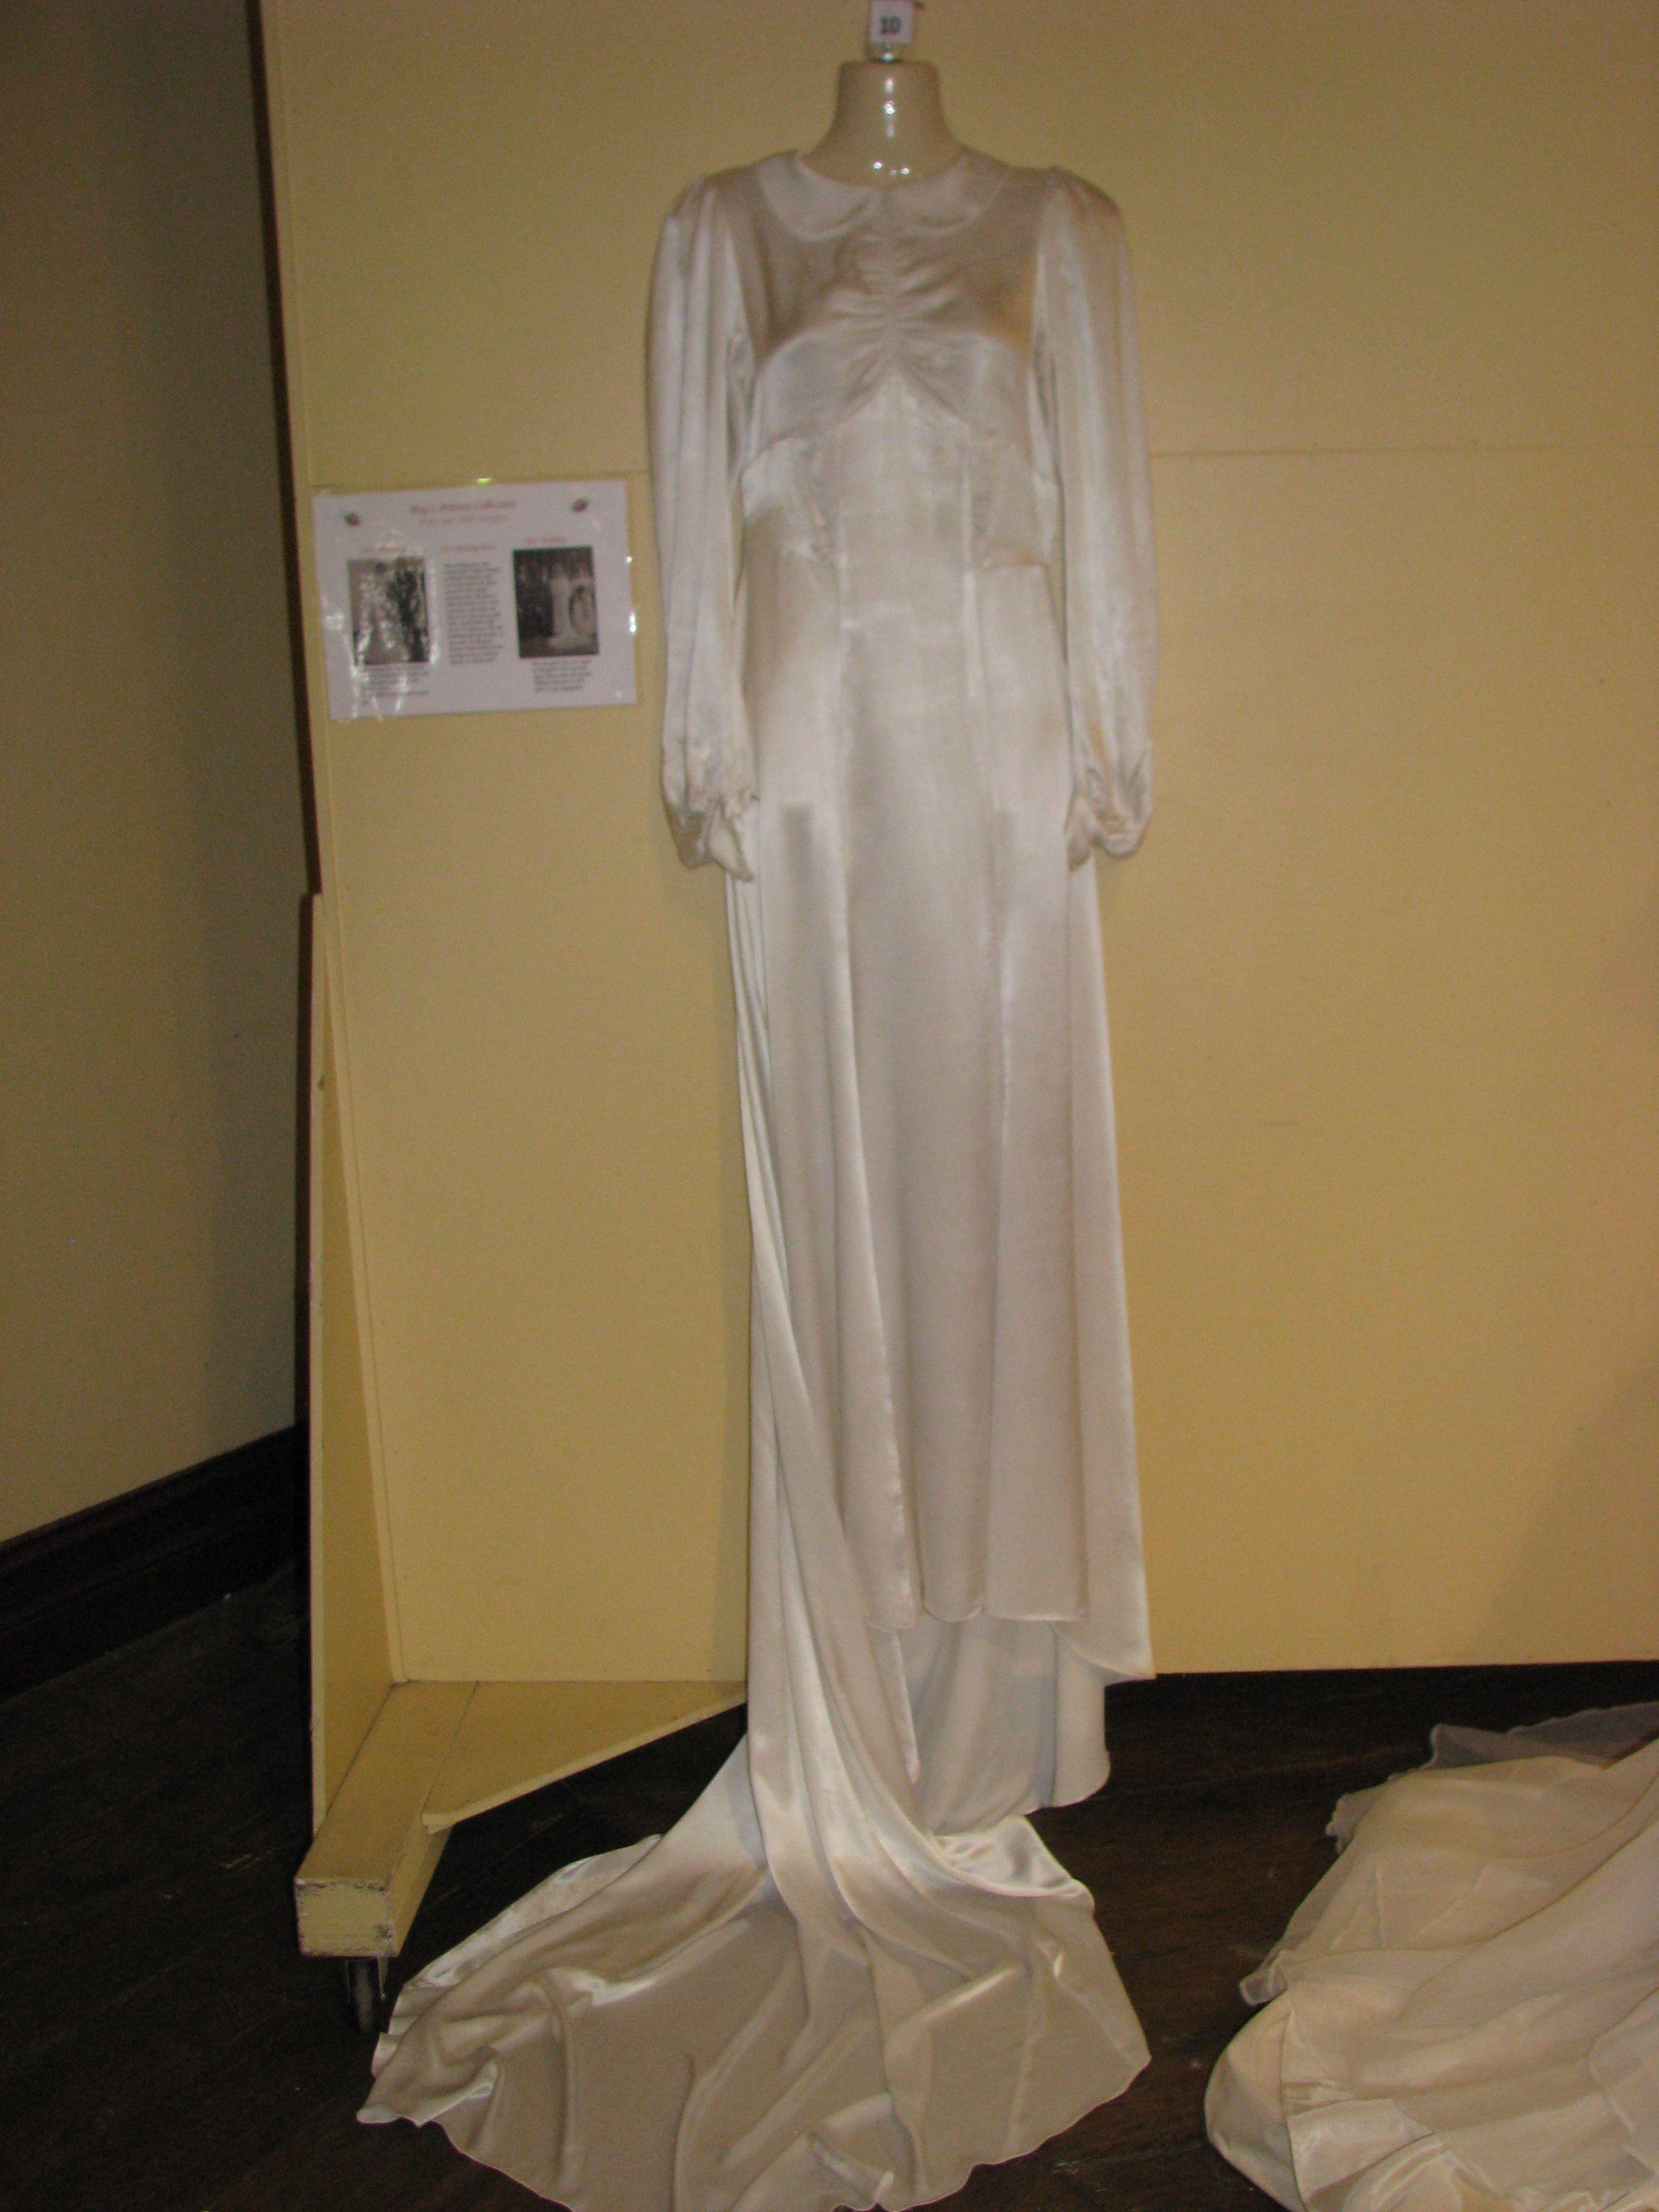 1930 wedding dress  us  Cream satin wedding dress hand made  Worn by two sisters